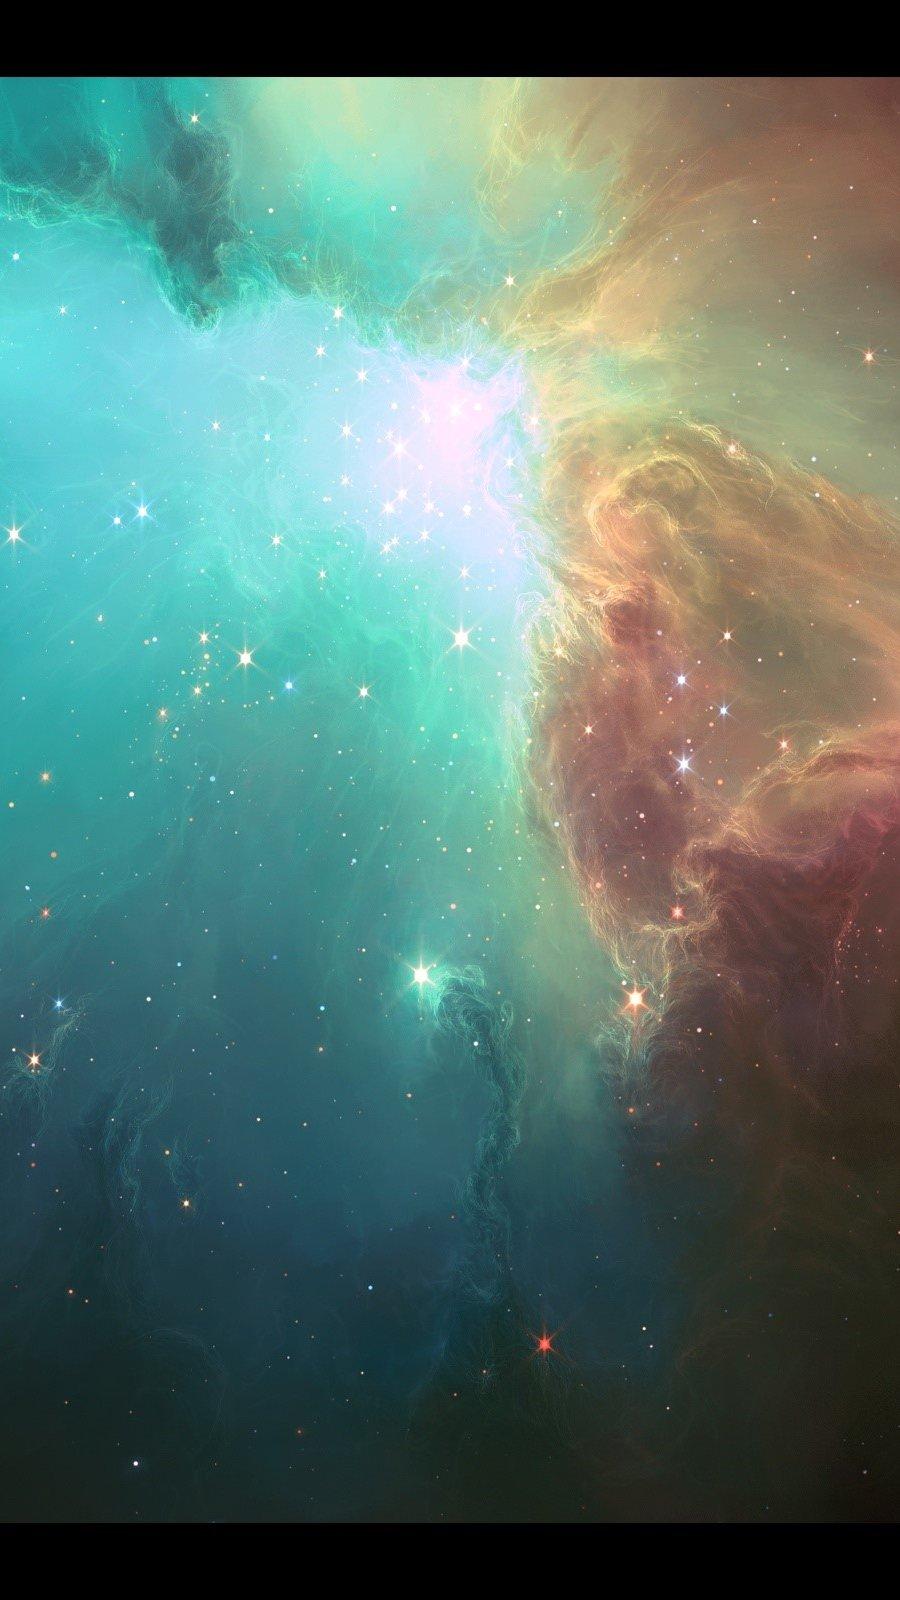 Fondos de pantalla Nebula Vertical